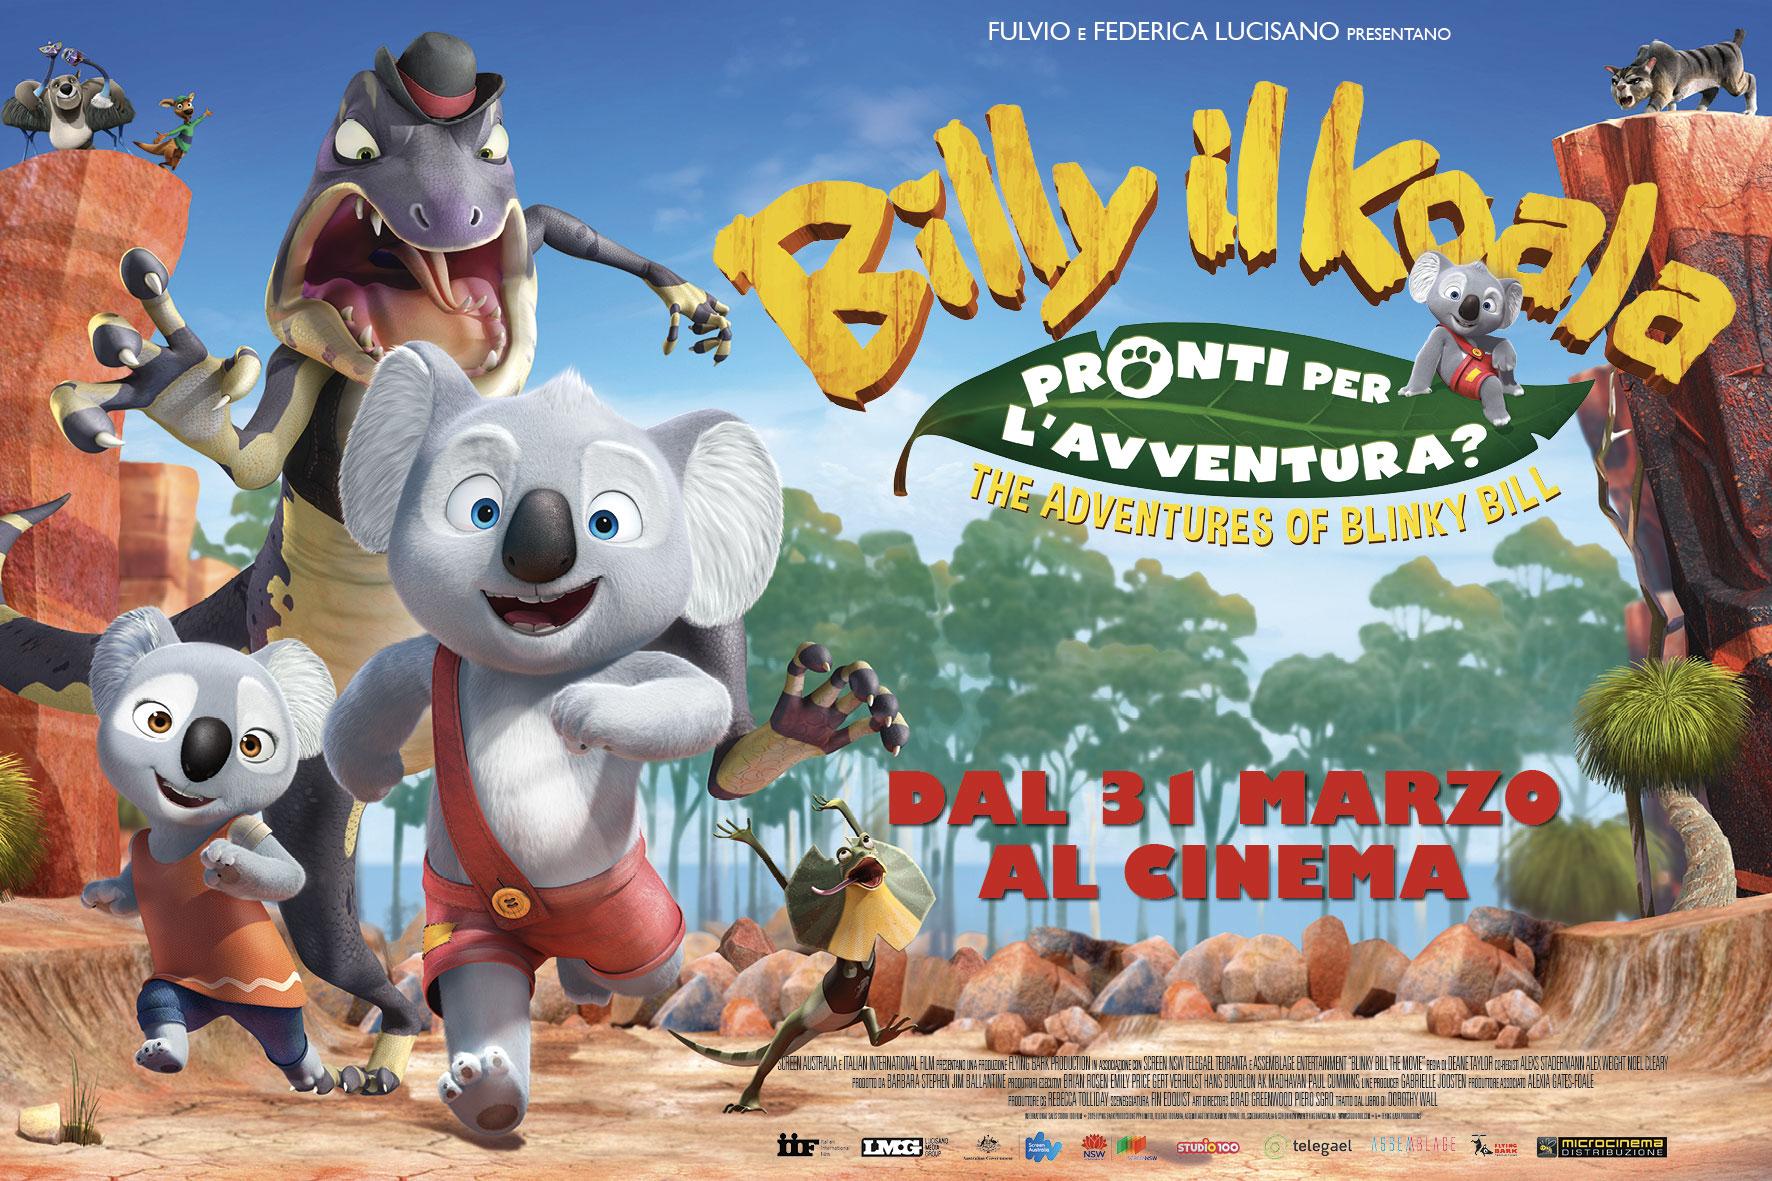 Billy il koala al cinema